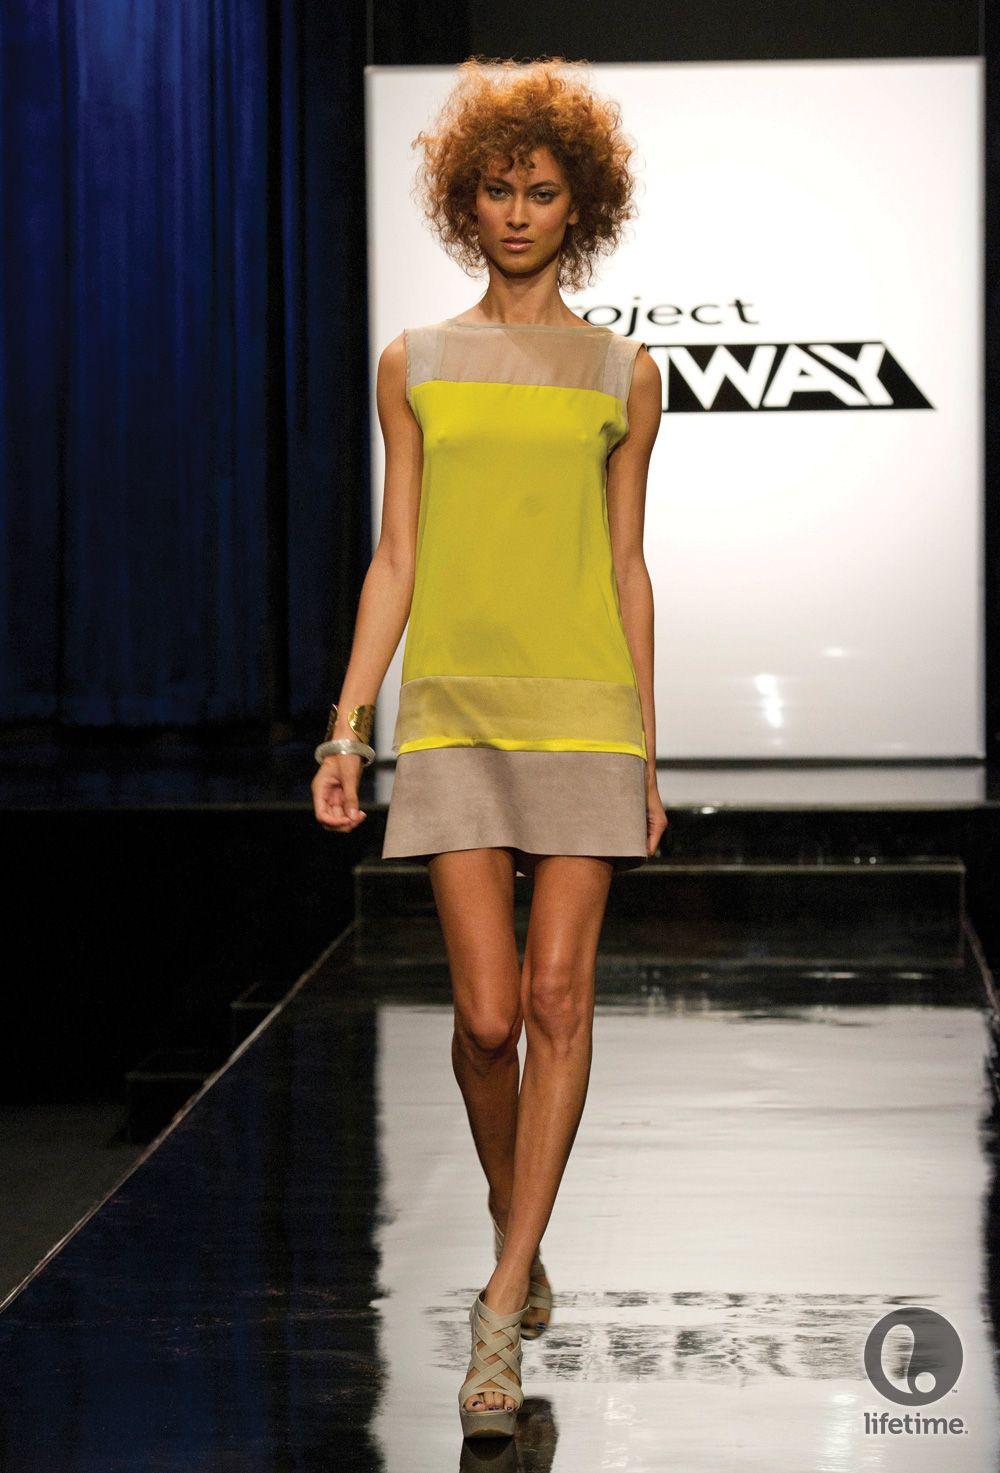 Design by Michelle Lesniak Franklin #ProjectRunway Season 11 #MakeItWork #Fashion